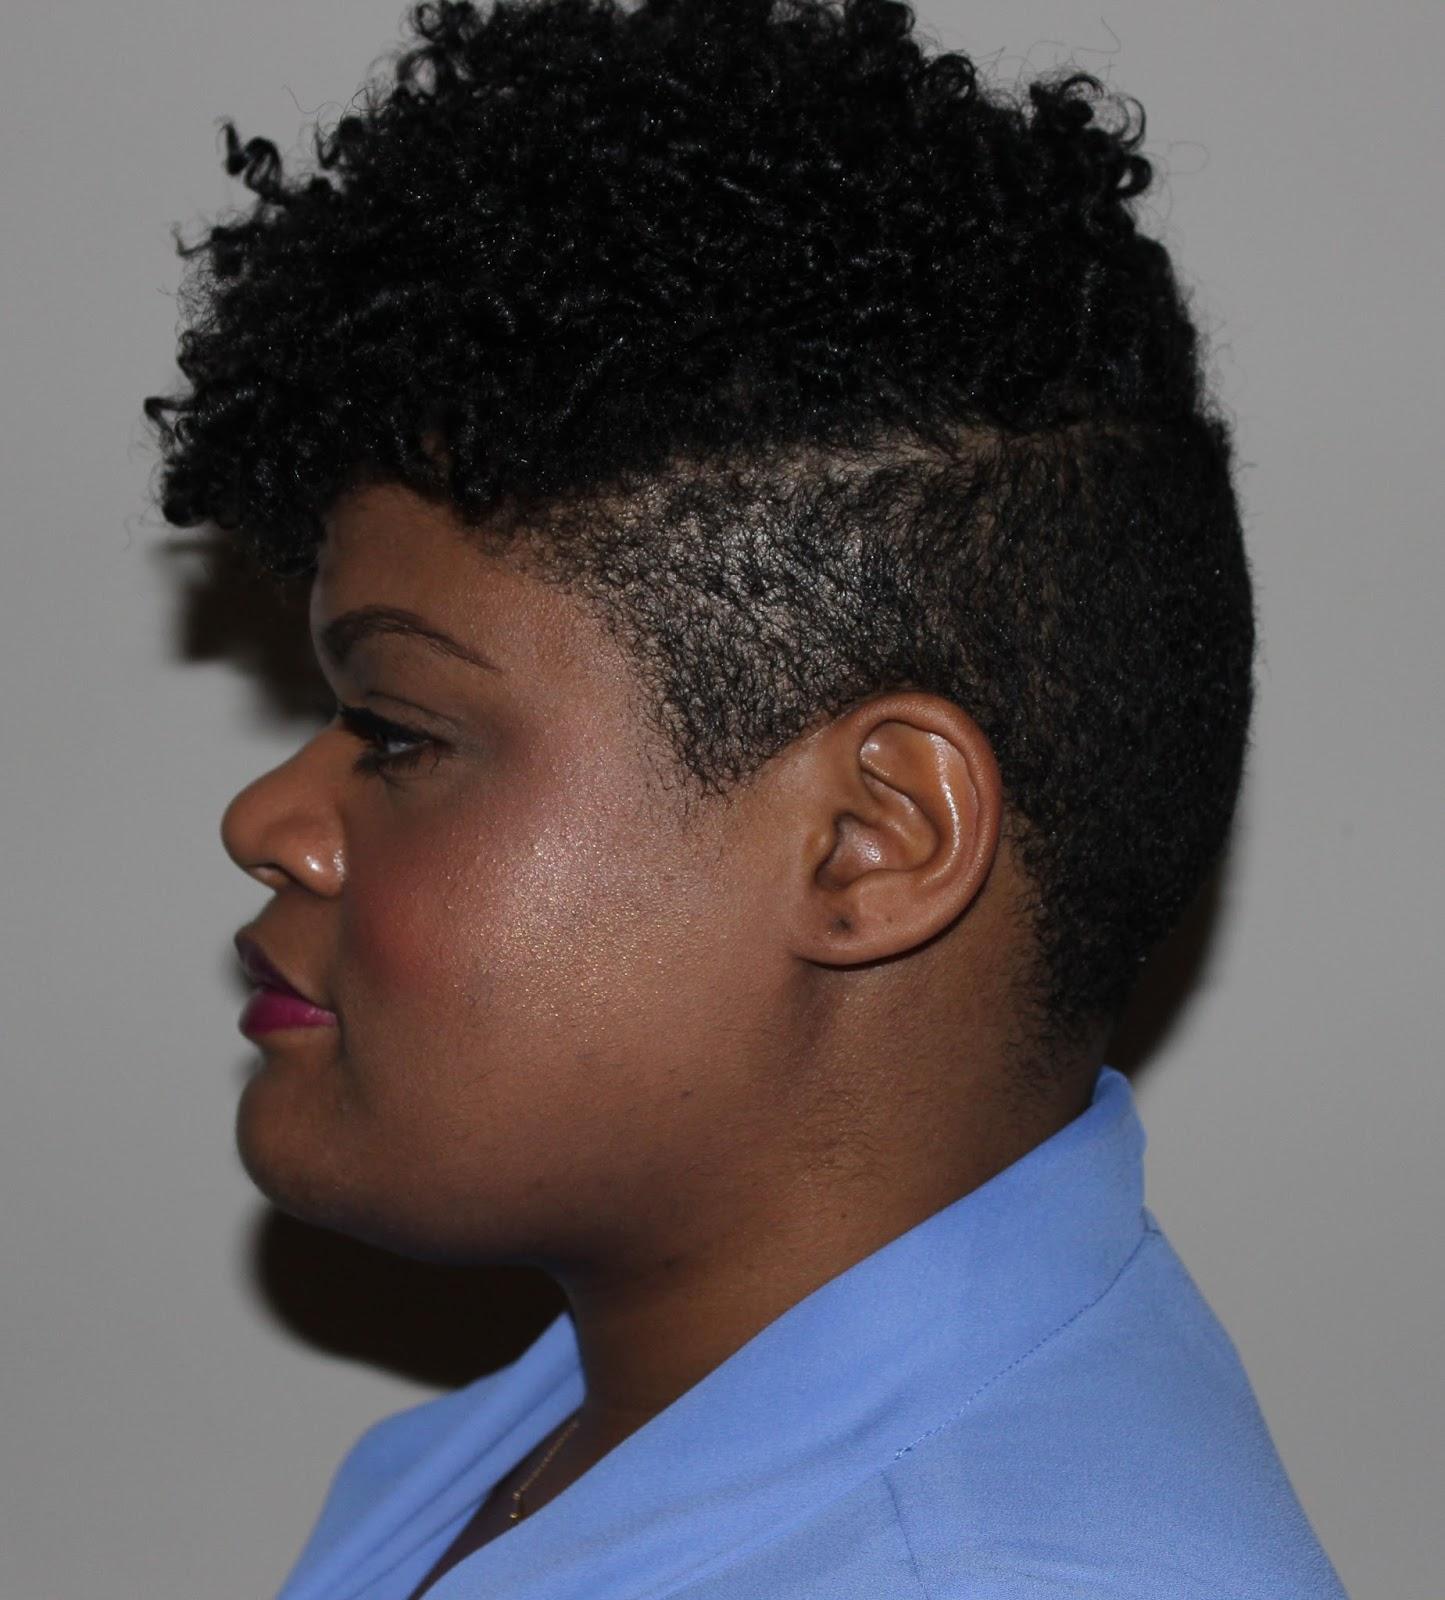 Phenomenal Fabellis Natural Hair Shaving It Off Short Hairstyles For Black Women Fulllsitofus